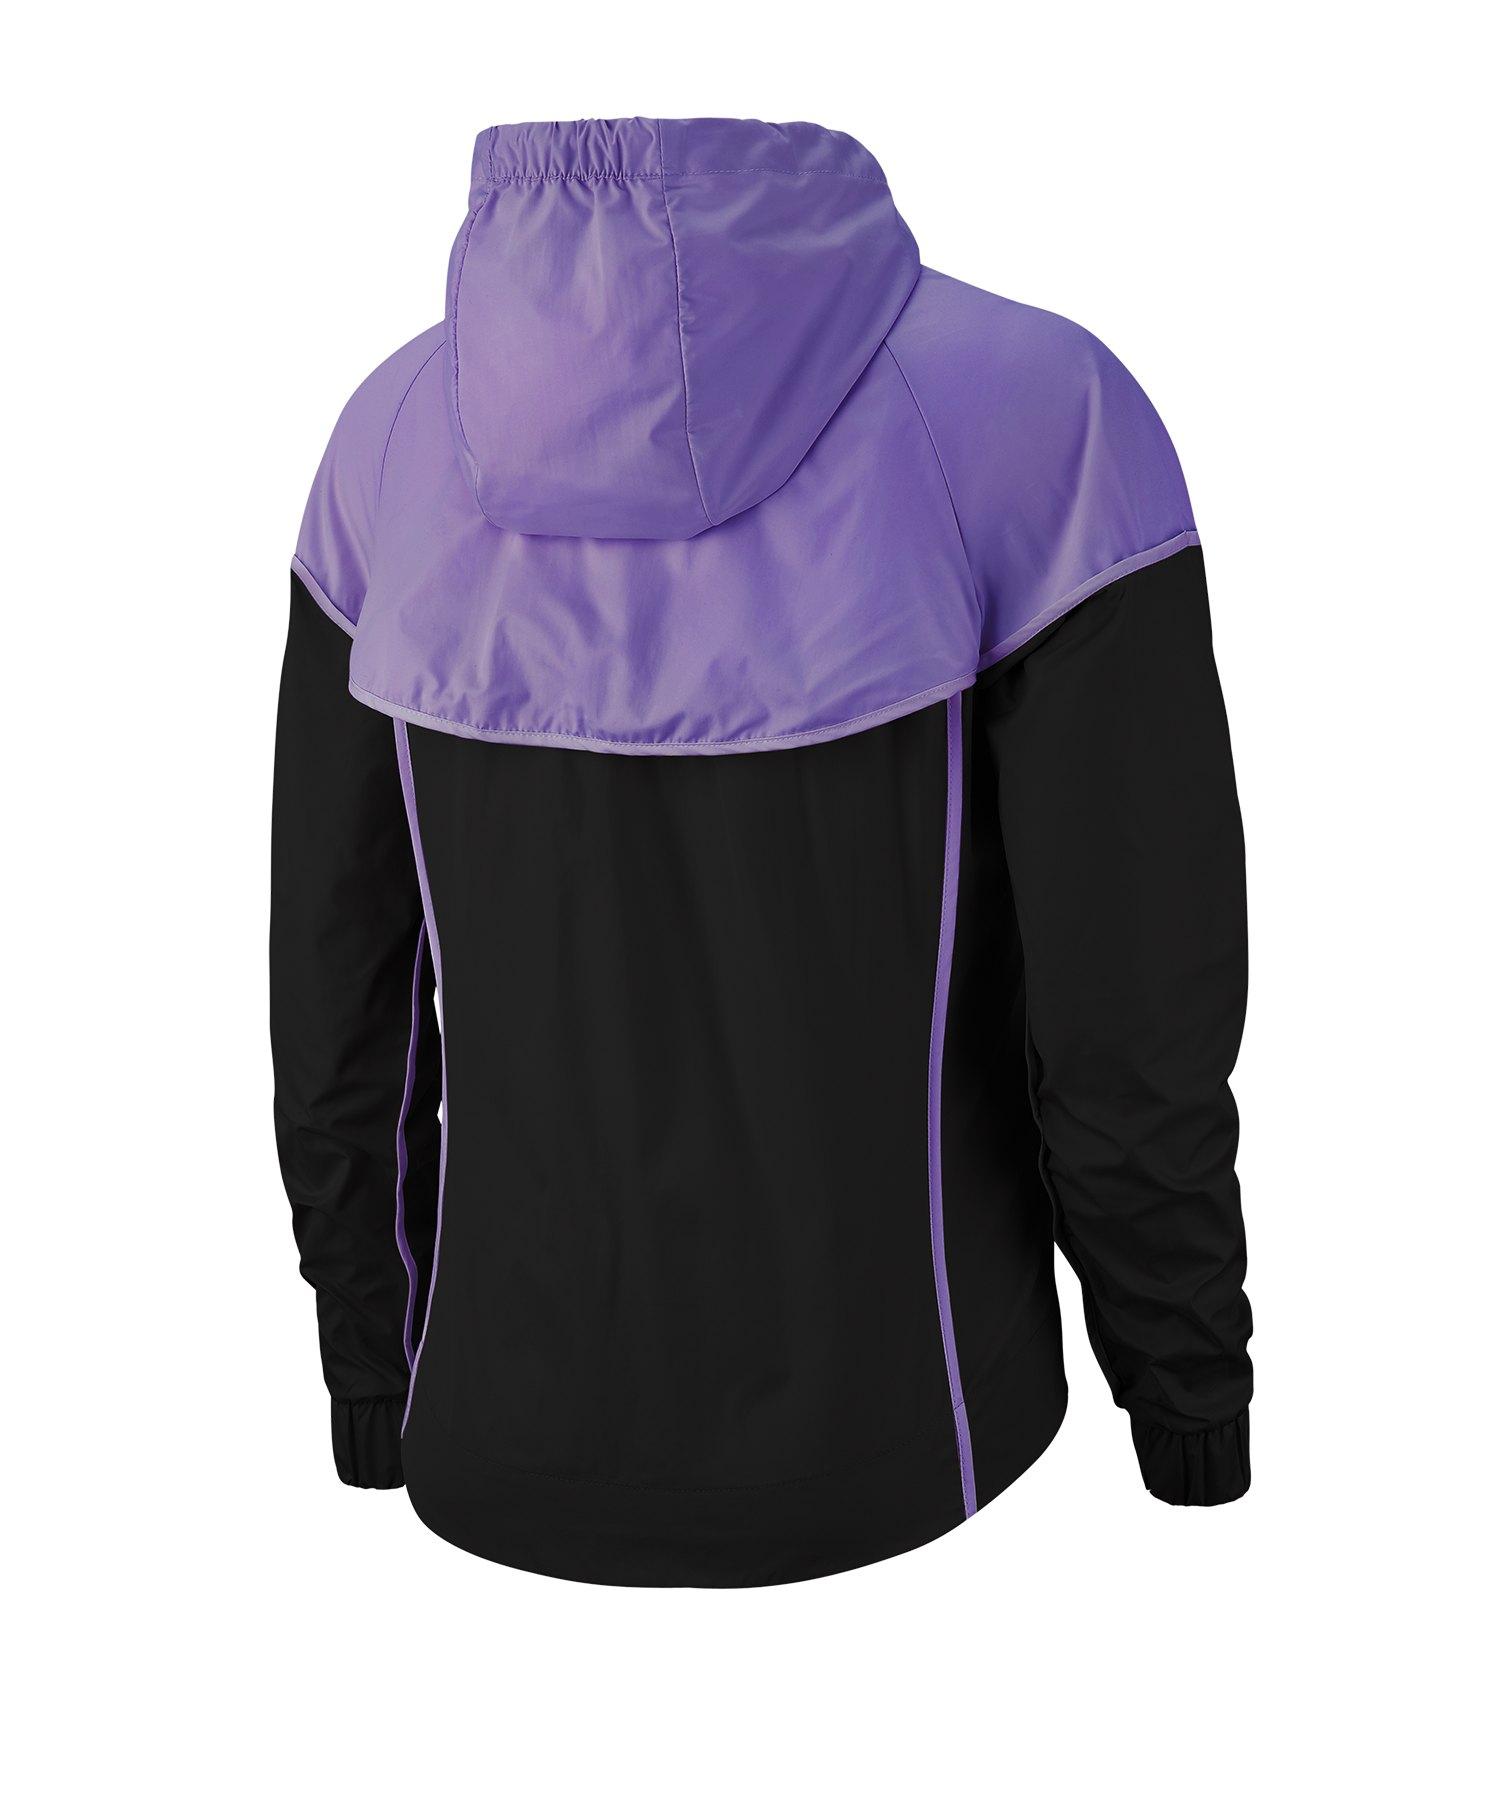 Nike Damen Lila F014 Jacket Windrunner Jacke VpGzSUMq